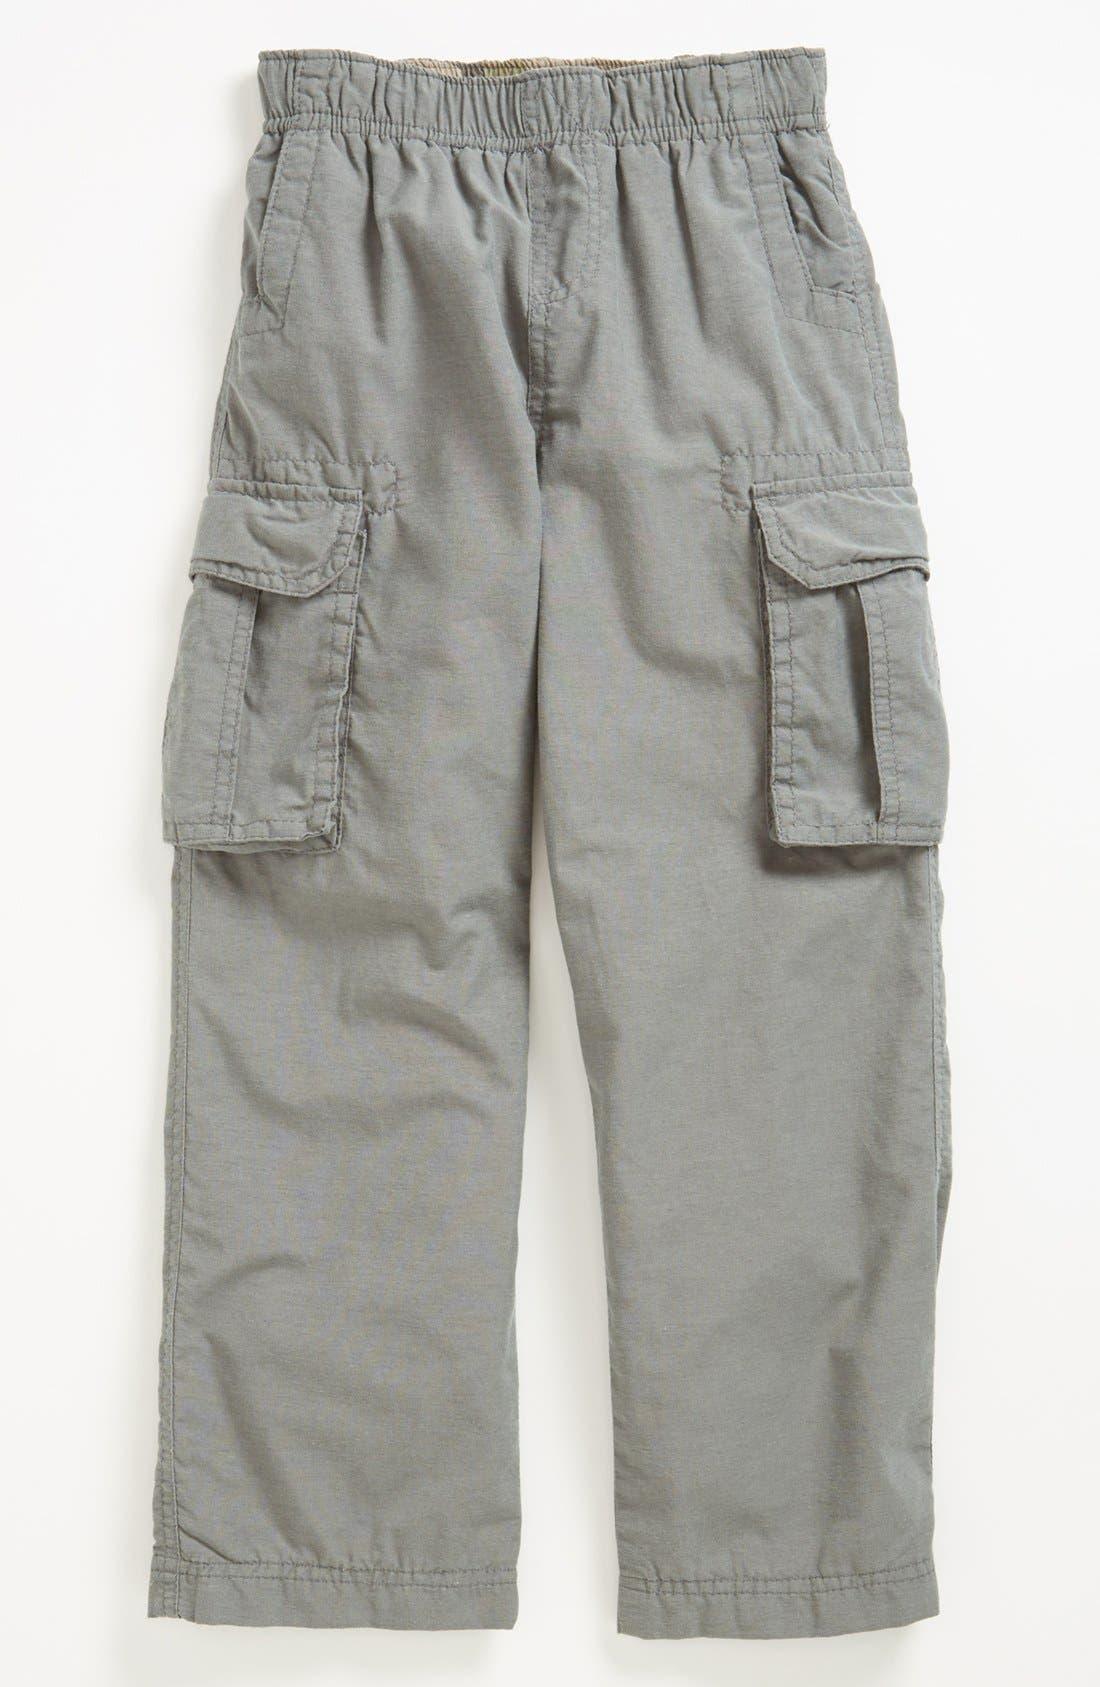 Alternate Image 1 Selected - Tucker + Tate 'Zephyr' Cargo Pants (Little Boys)